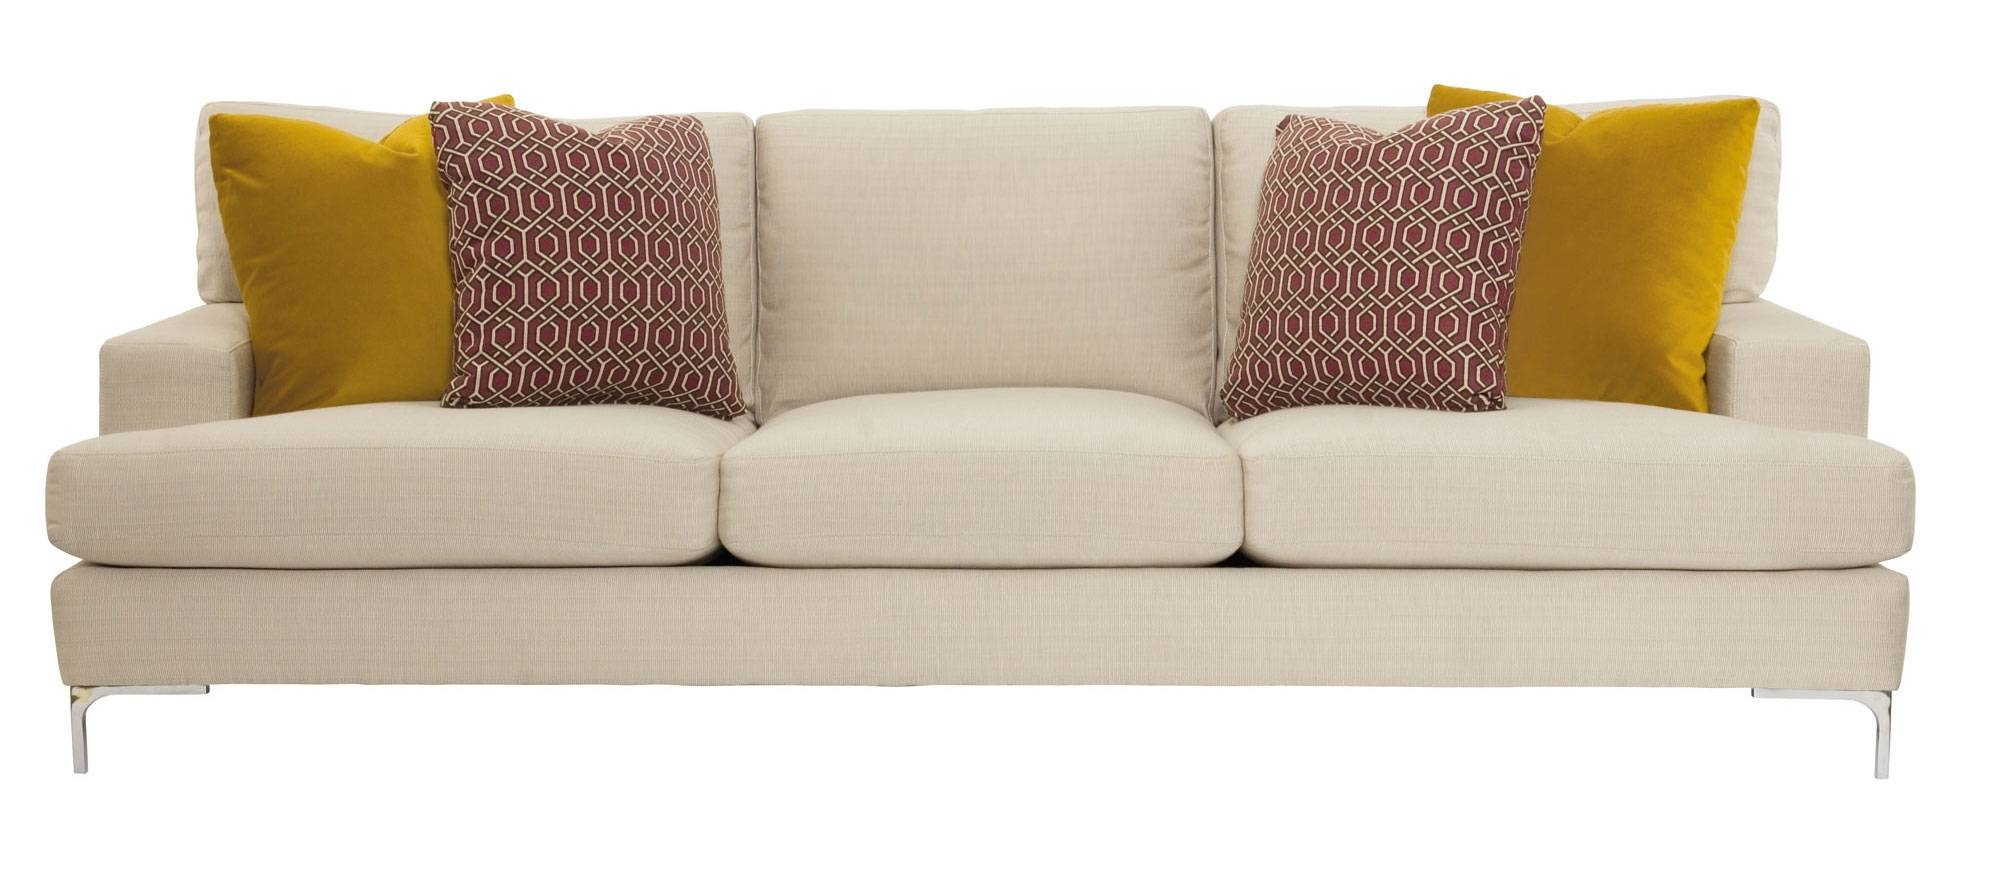 Sofa | Bernhardt regarding Bernhardt Sofas (Image 11 of 15)